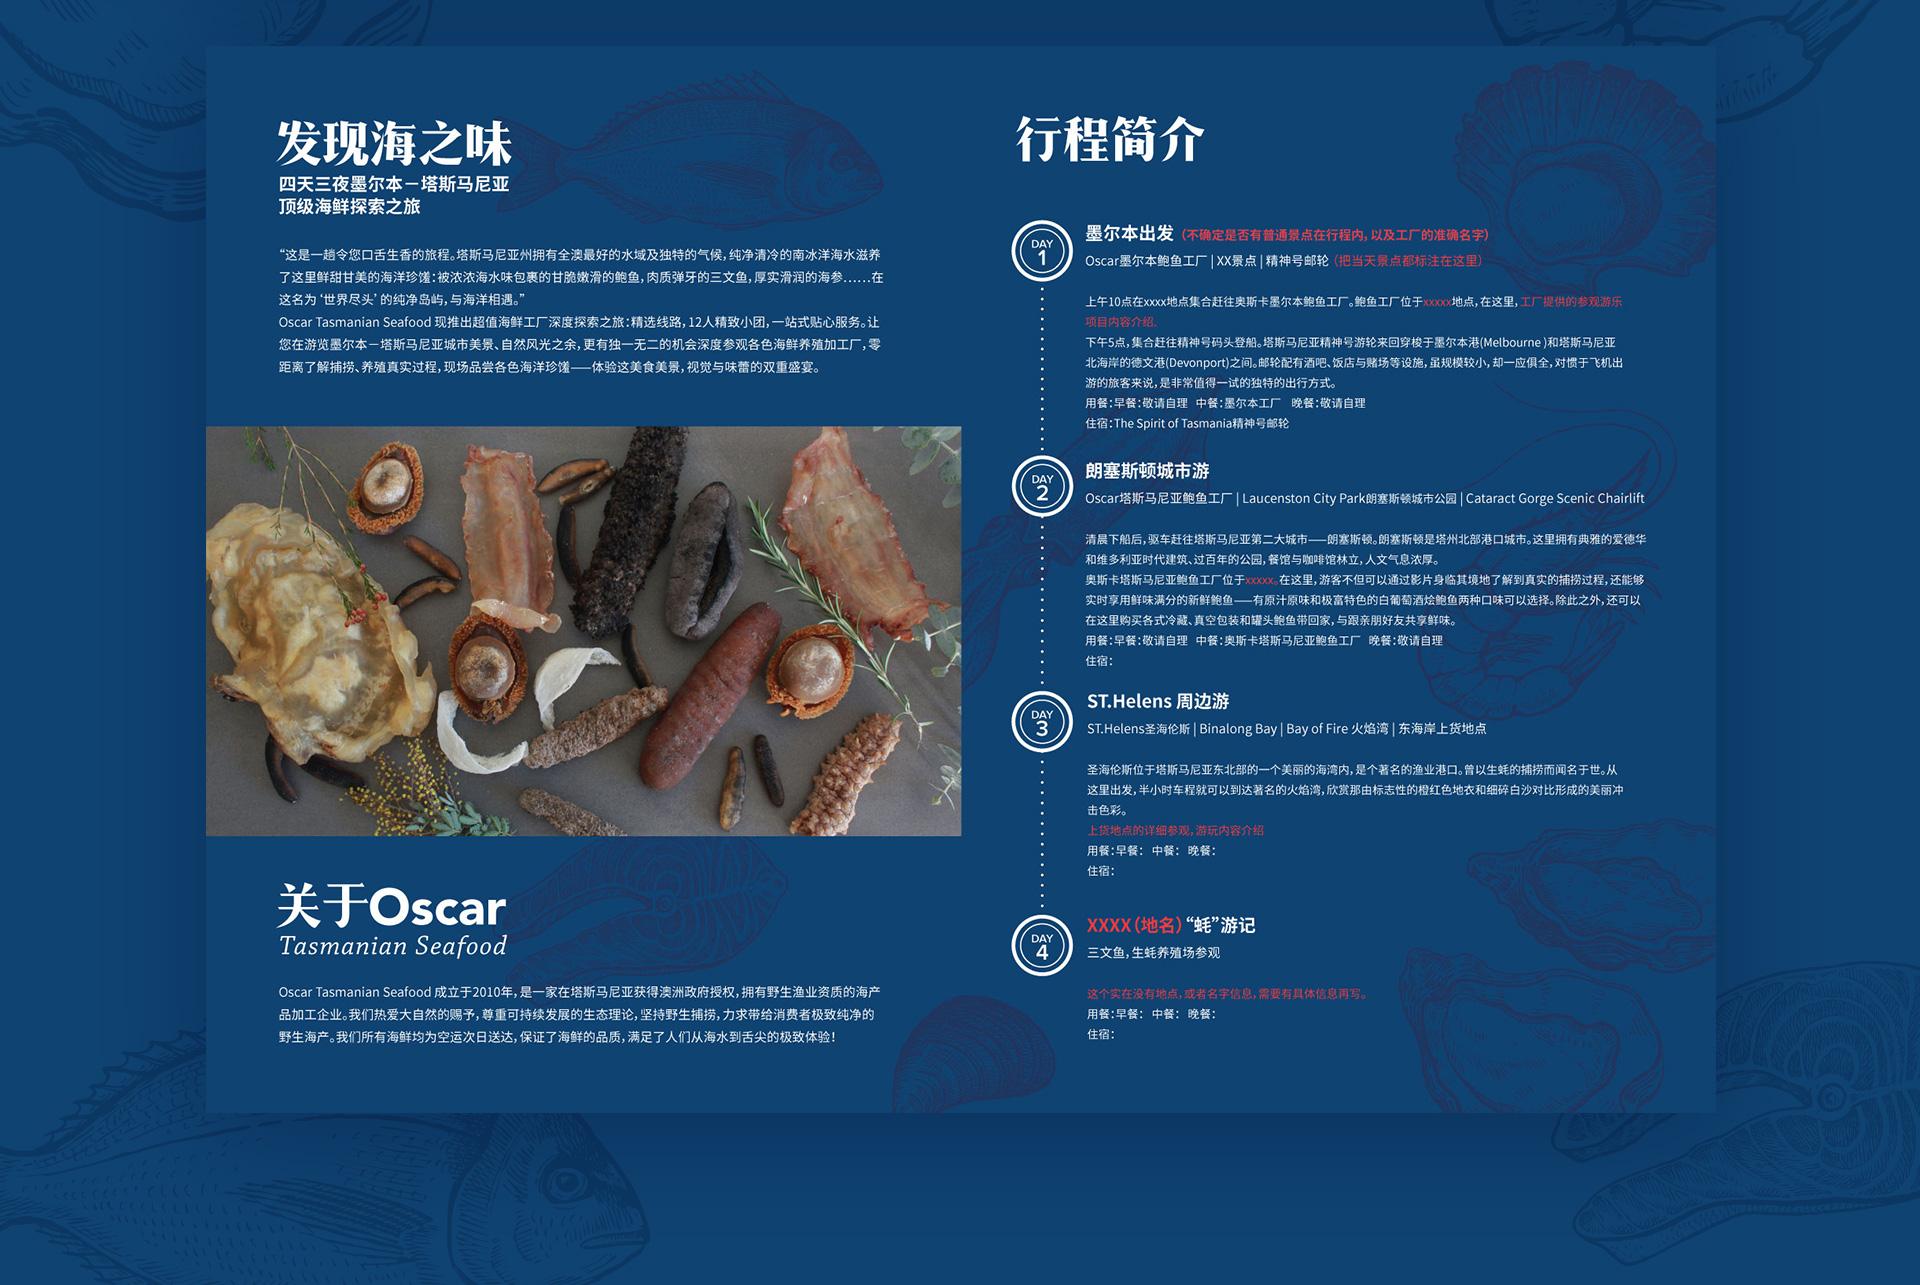 seafood tour brochure design by Z Creative Studio Branding & Graphic Design Melbourne